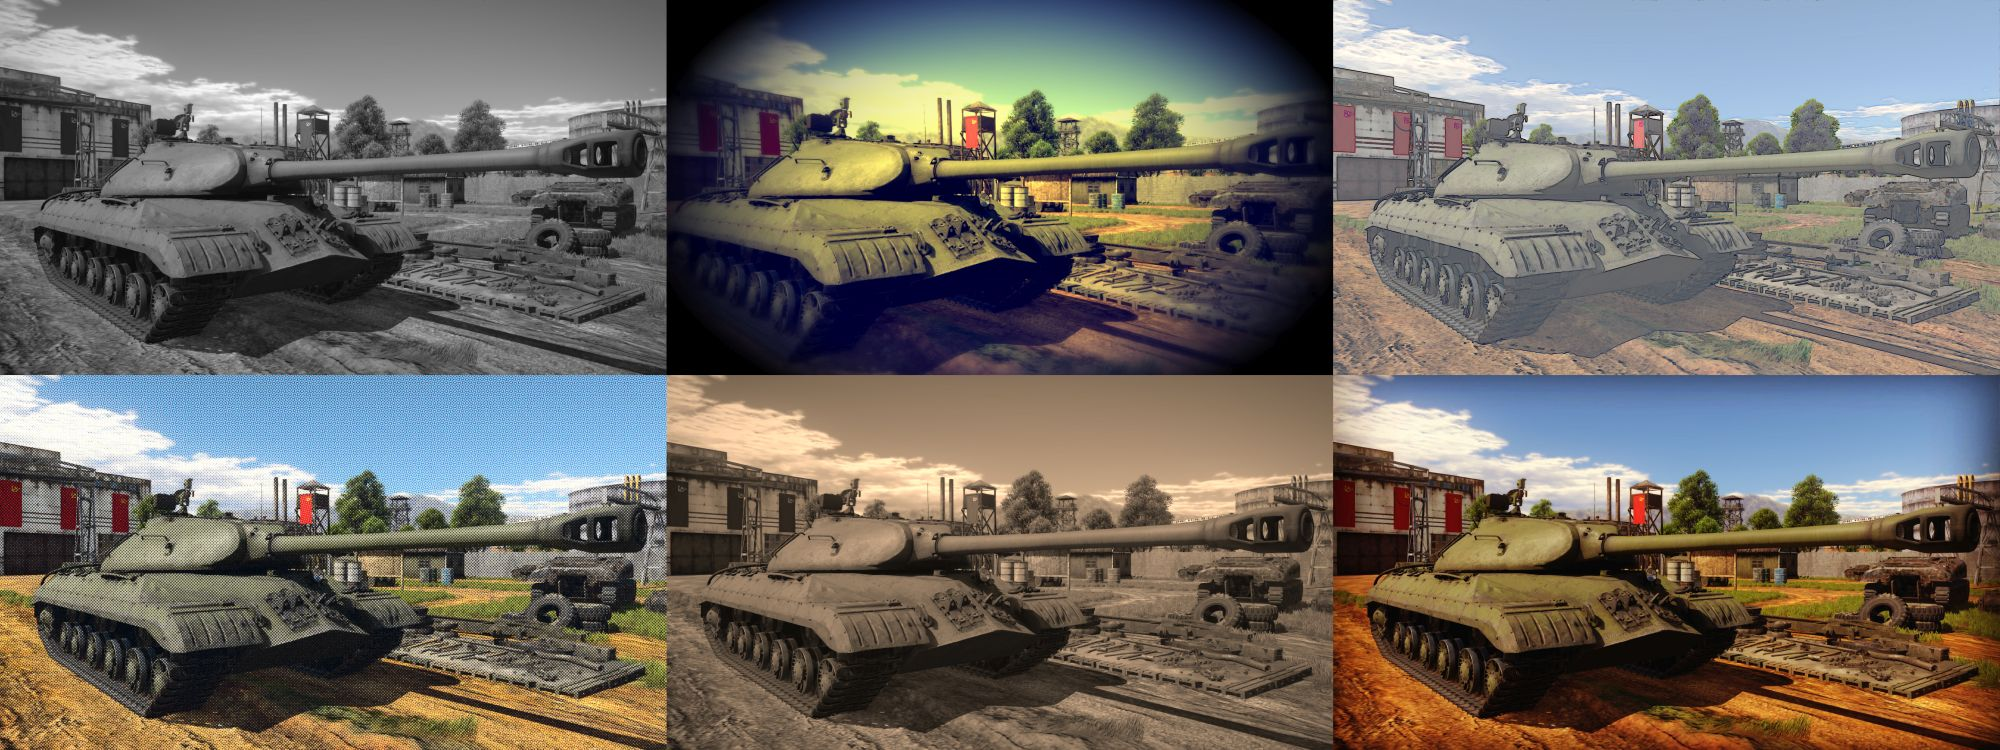 war-thunder-nvidia-ansel-filter-collage